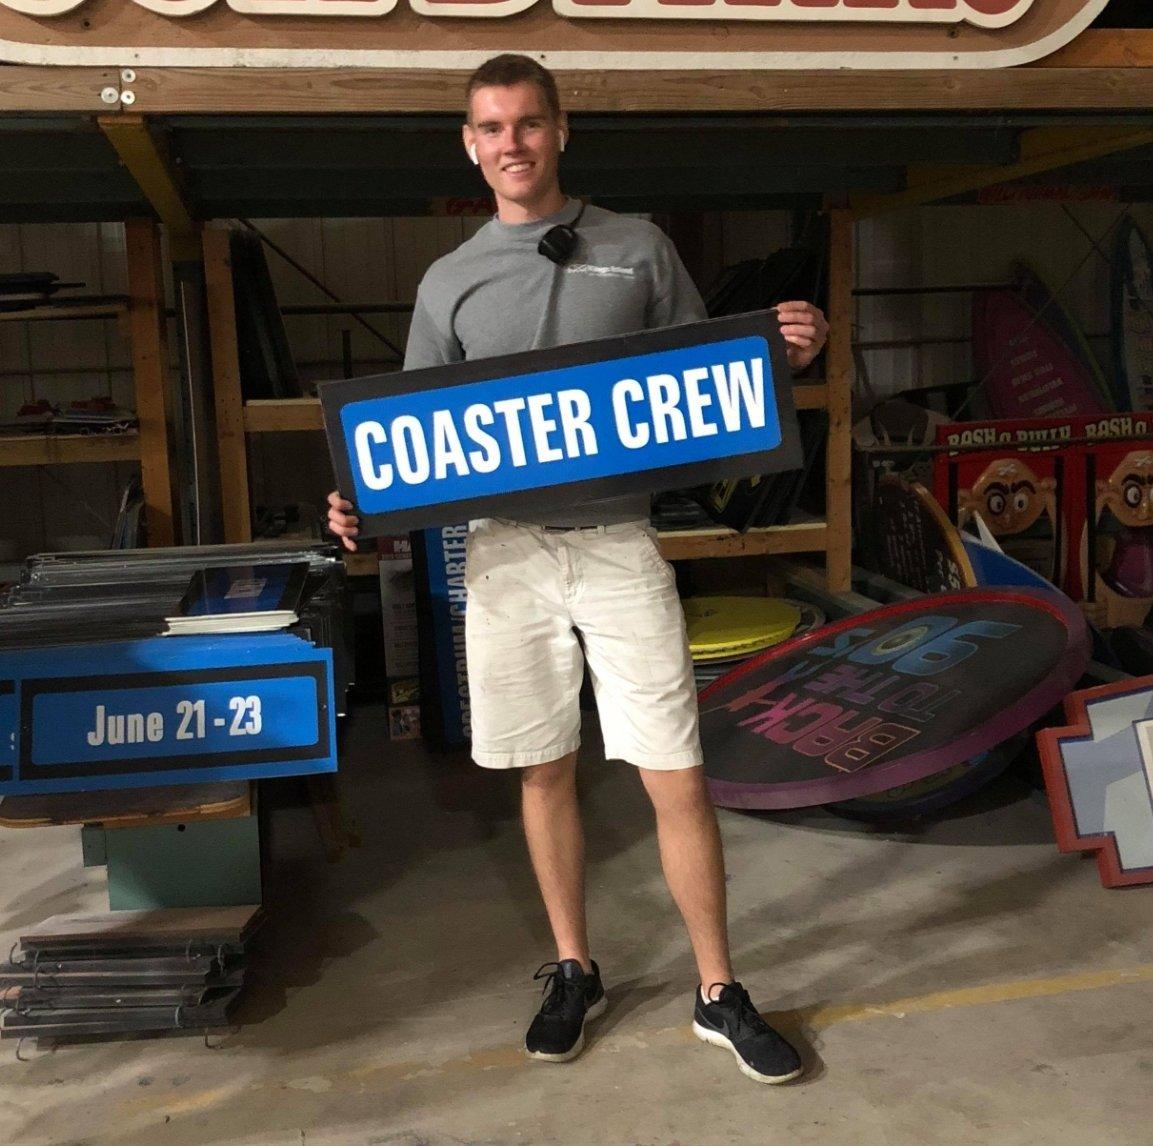 Coastercrew photo